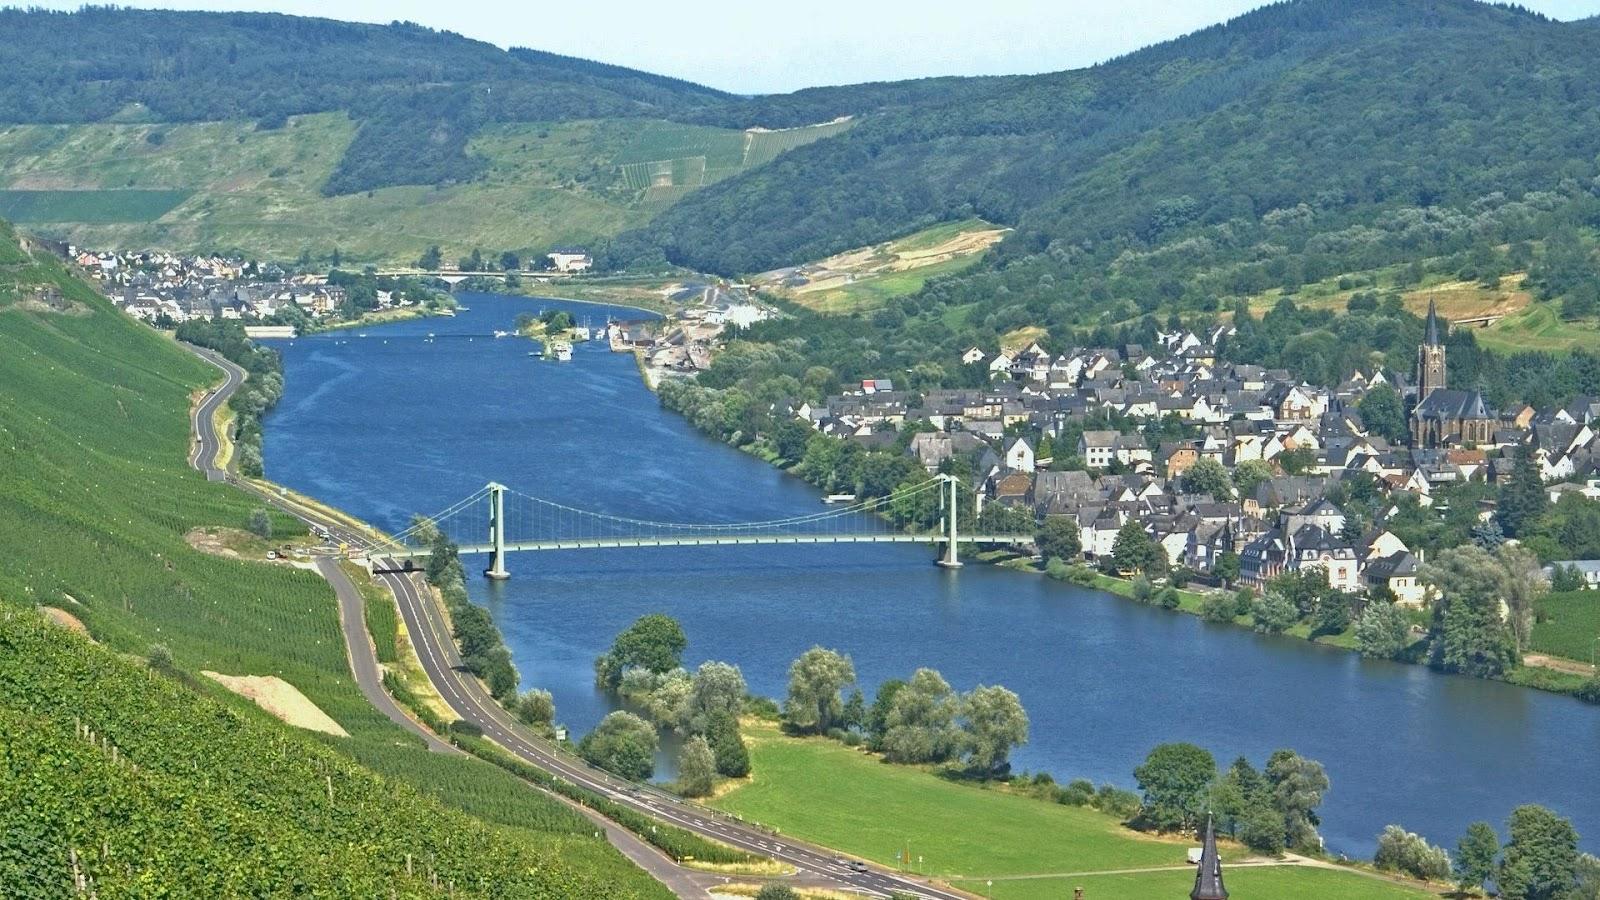 Wallpaper proslut beautiful nature wallpapers hd river - Bridge wallpaper hd ...